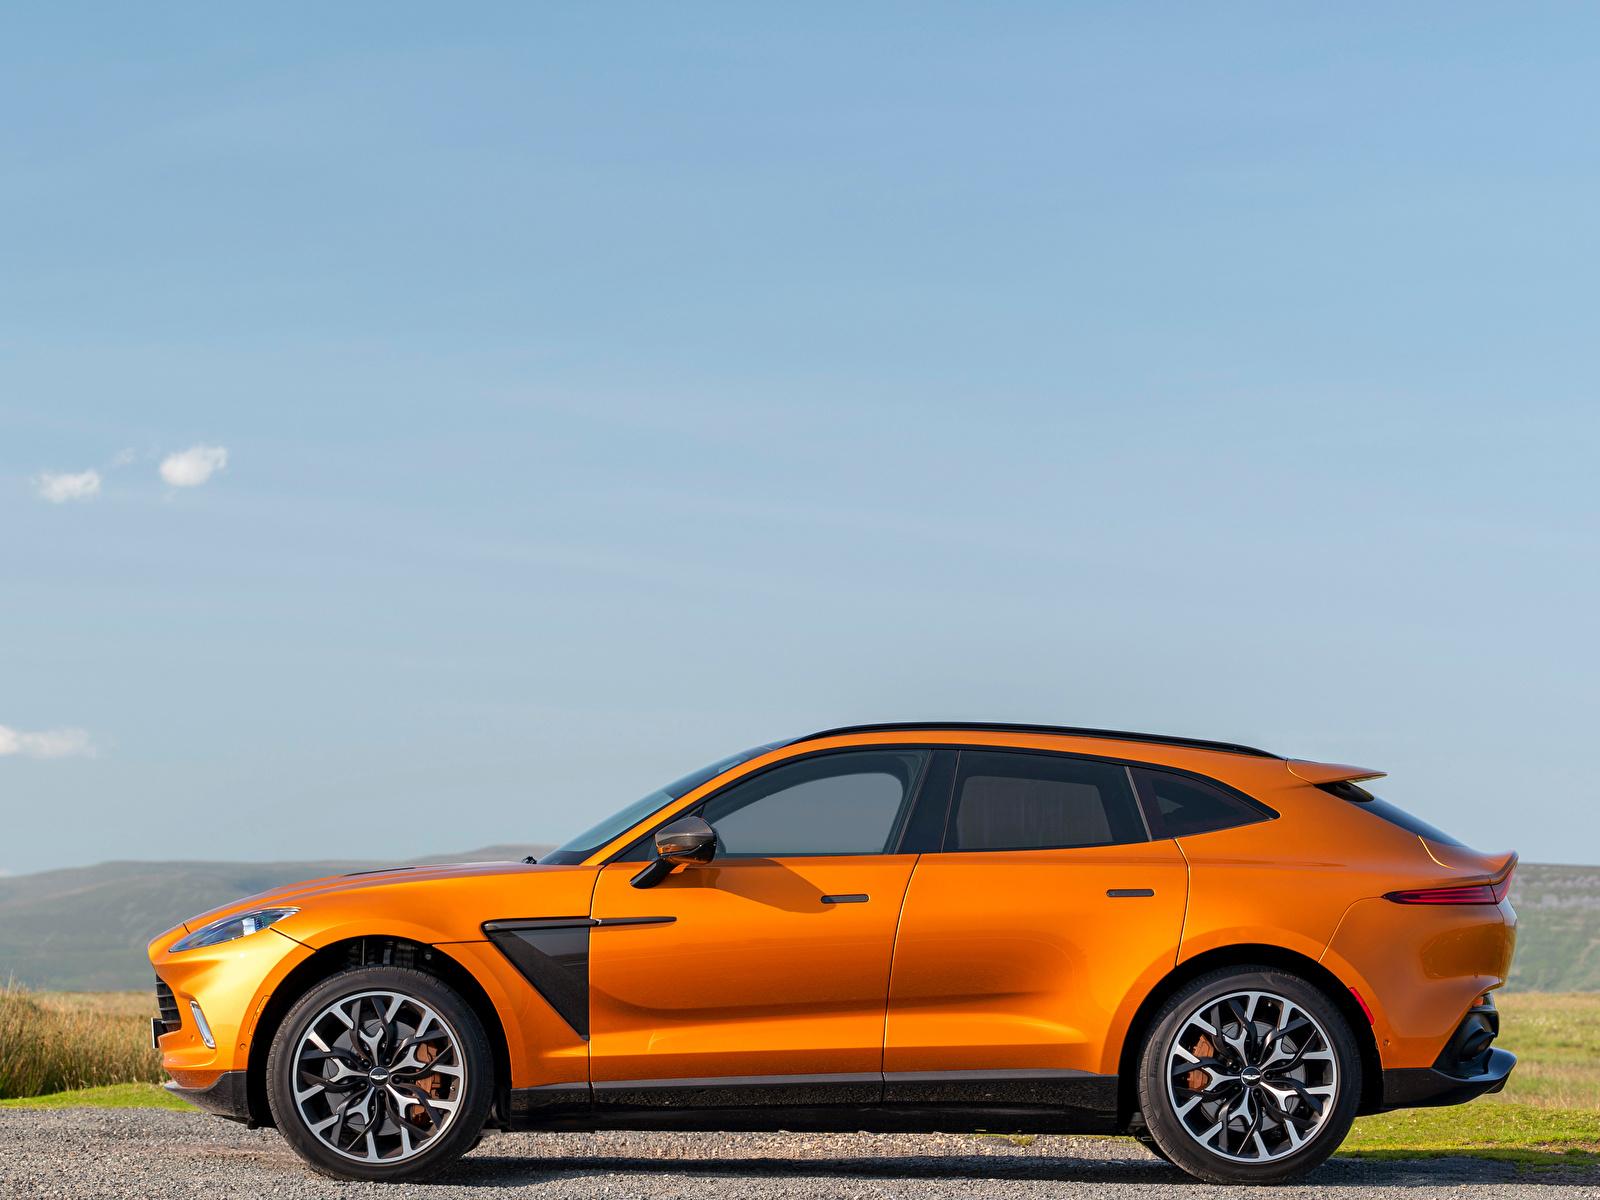 Фотографии Aston Martin Кроссовер DBX, North America, 2020 оранжевая Сбоку Металлик Автомобили 1600x1200 Астон мартин CUV оранжевых оранжевые Оранжевый авто машина машины автомобиль